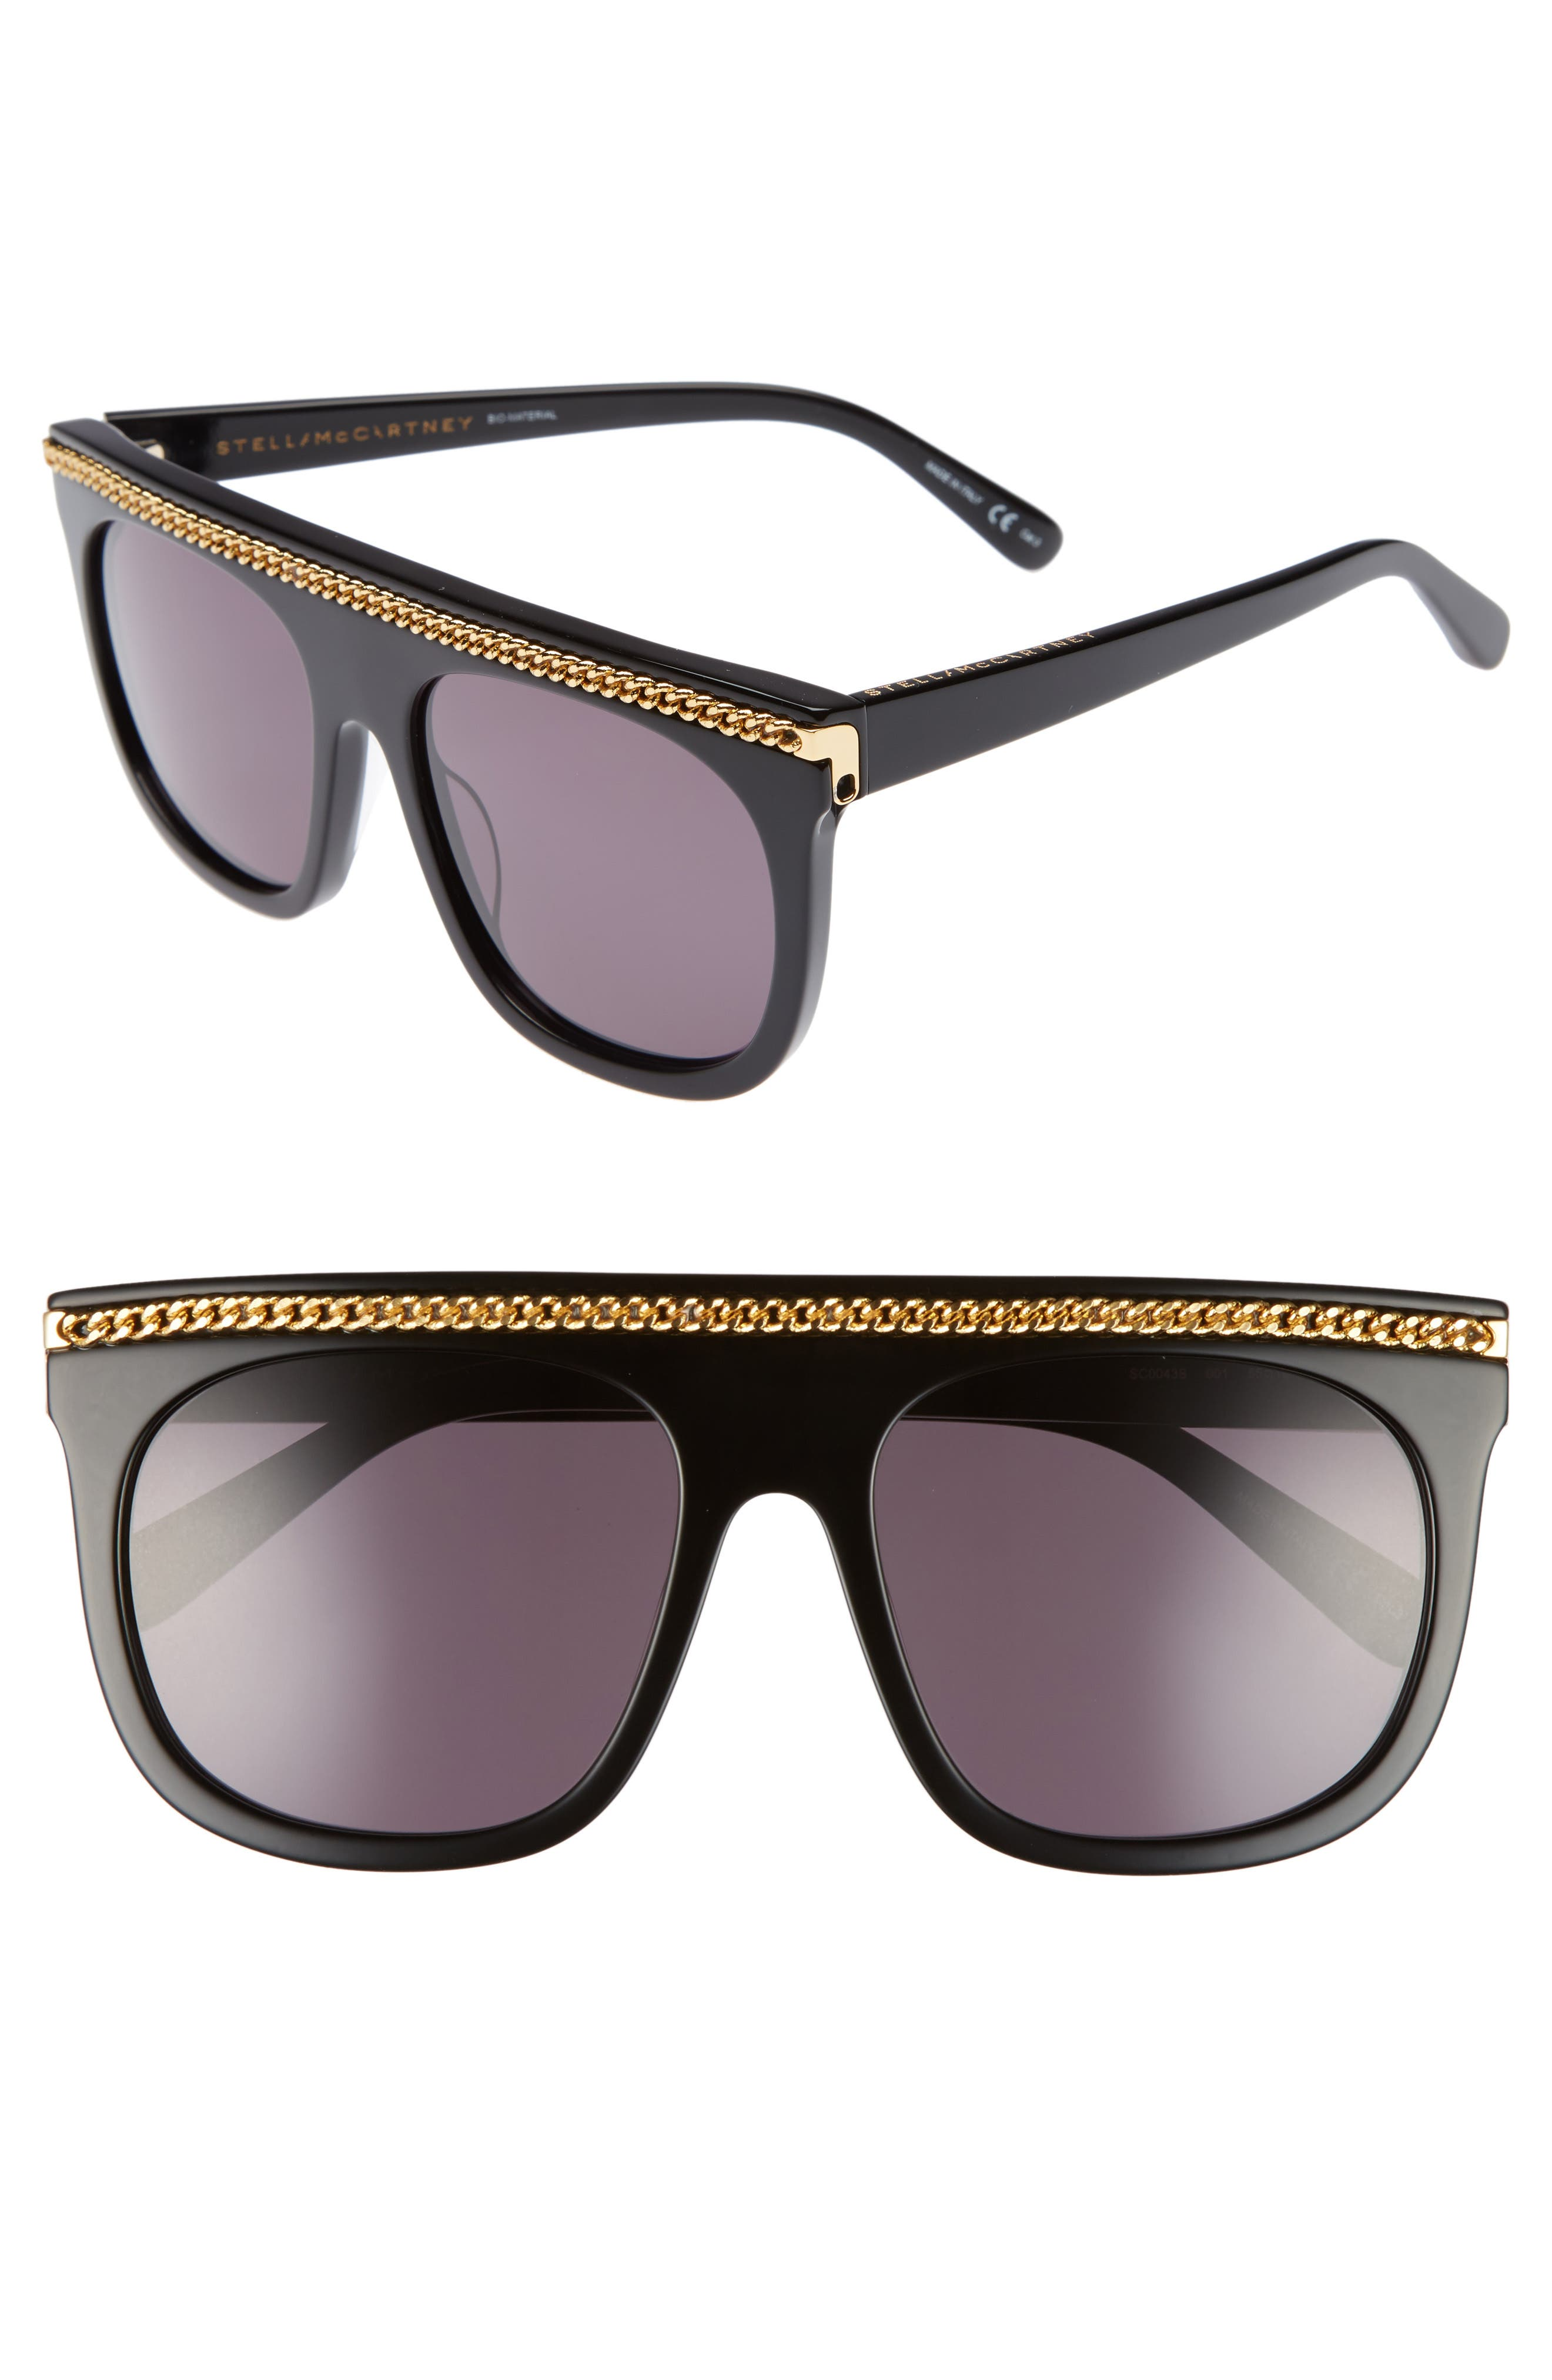 Stella McCartney 55mm Flat Top Sunglasses